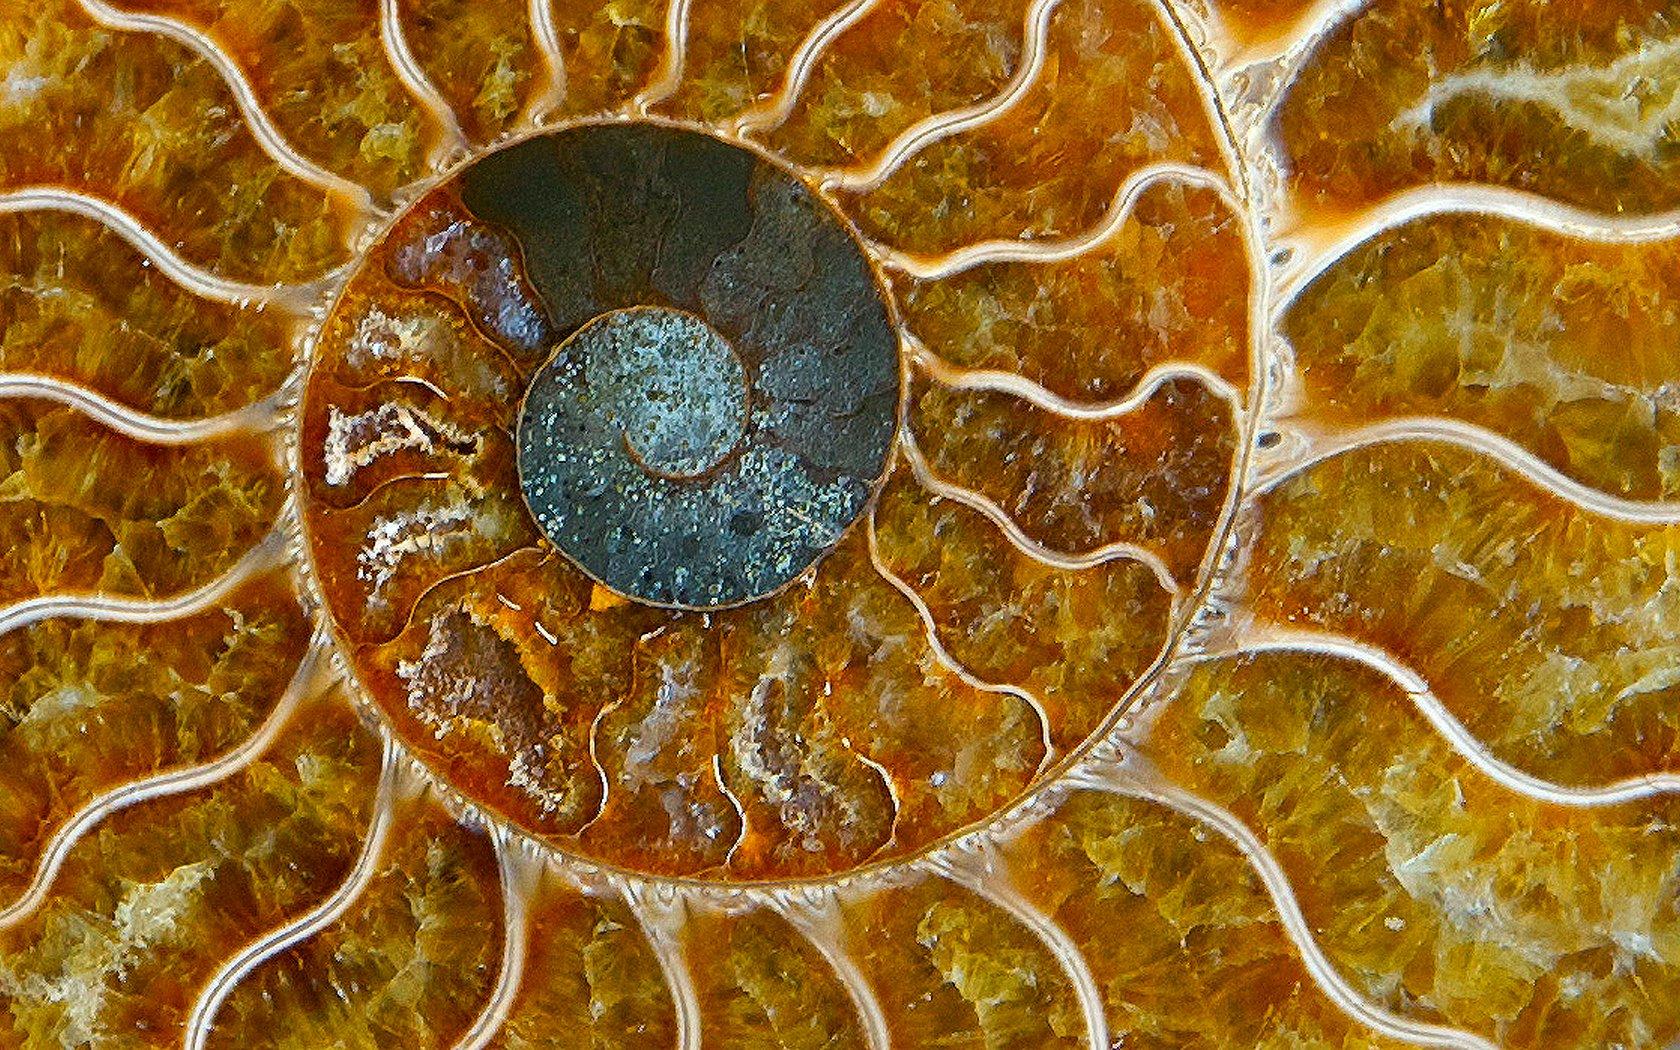 Polished ammonite fossil displaying a fibonacci spiral. Image Credit wplynn via Flickr.